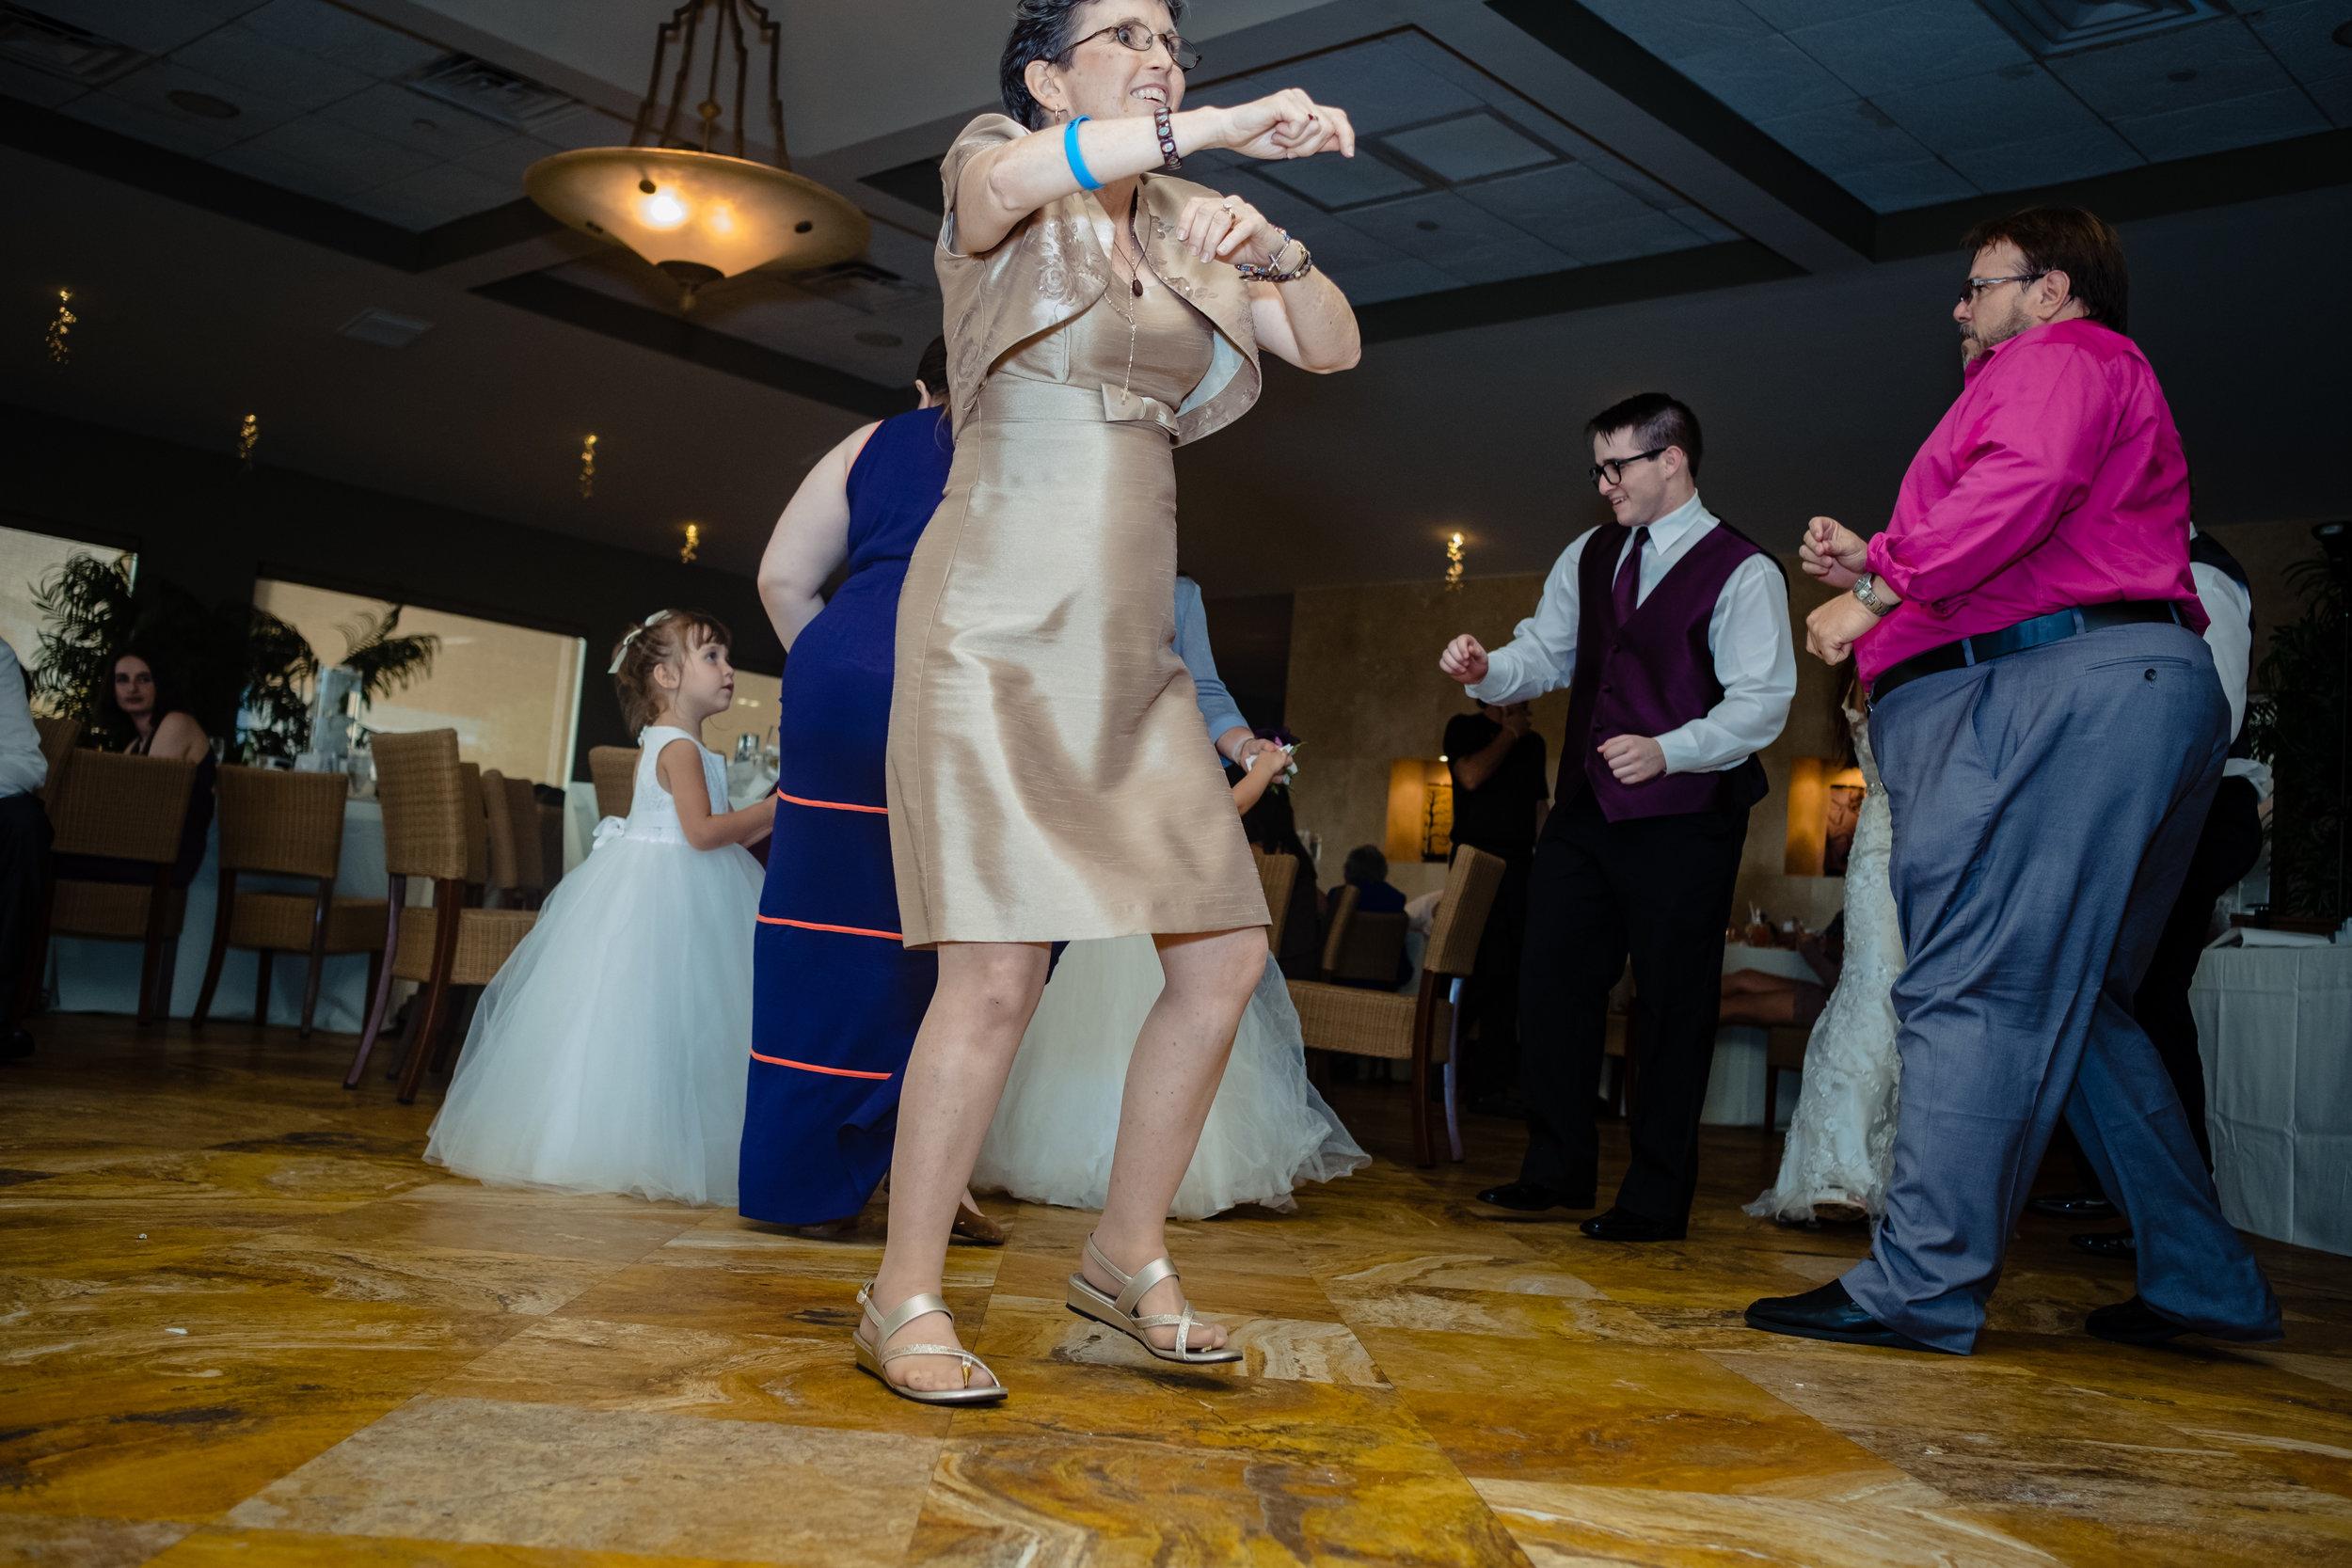 HAH_Zoe and Daniel_Clearwater Wedding_726_2018.jpg